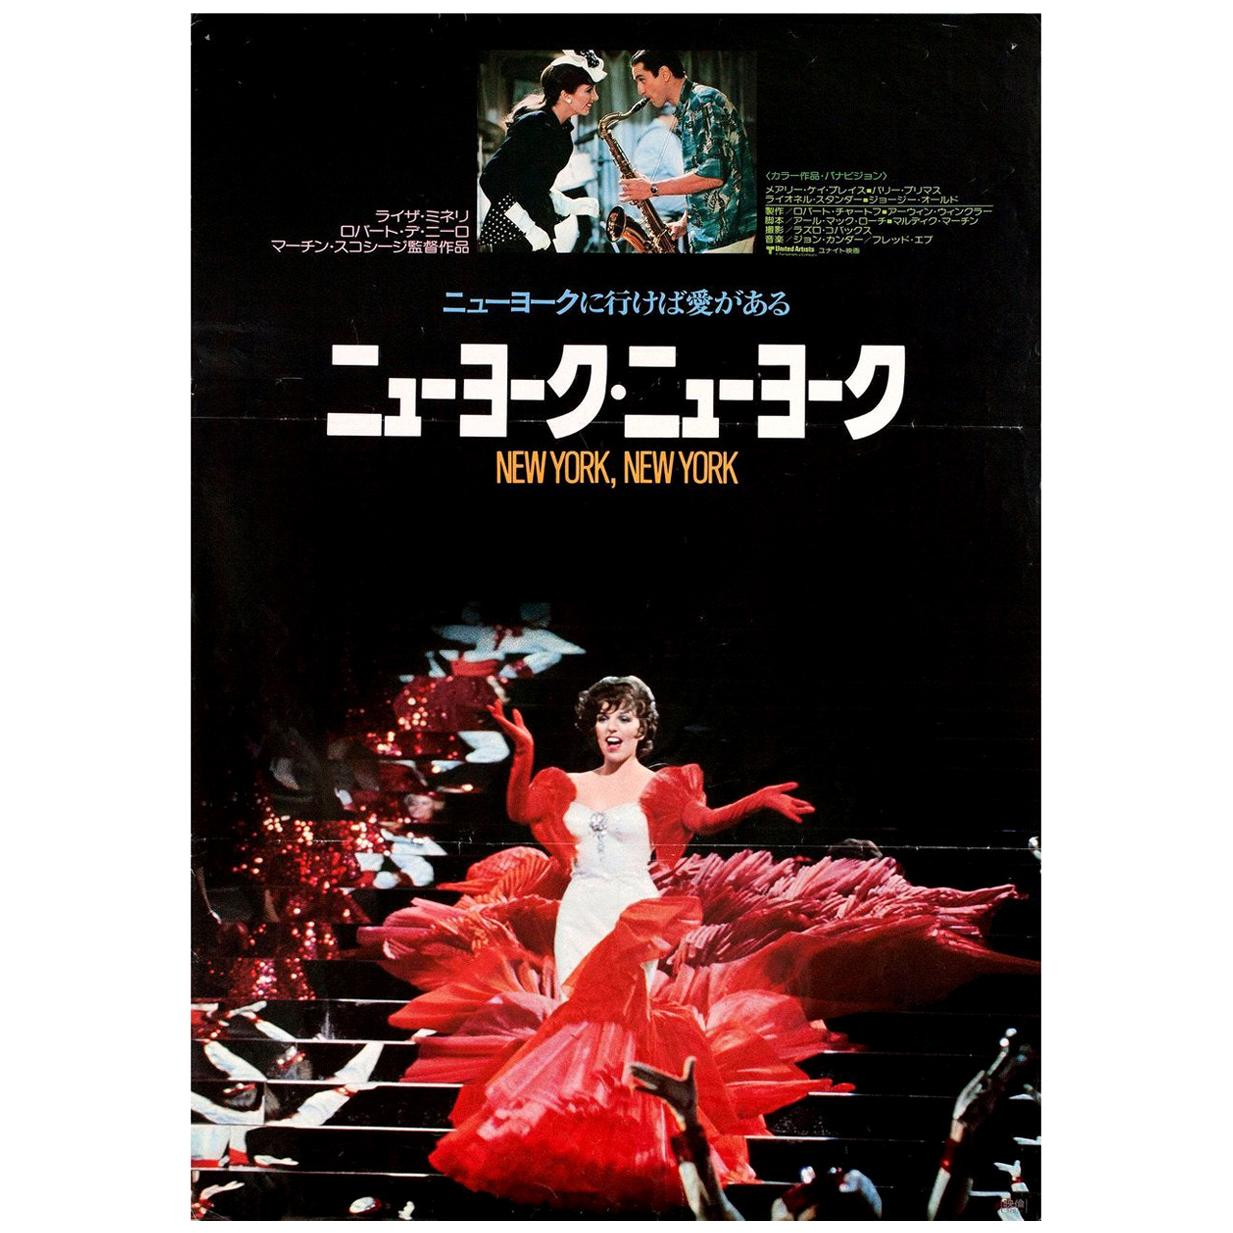 New York, New York 1977 Japanese B2 Film Poster